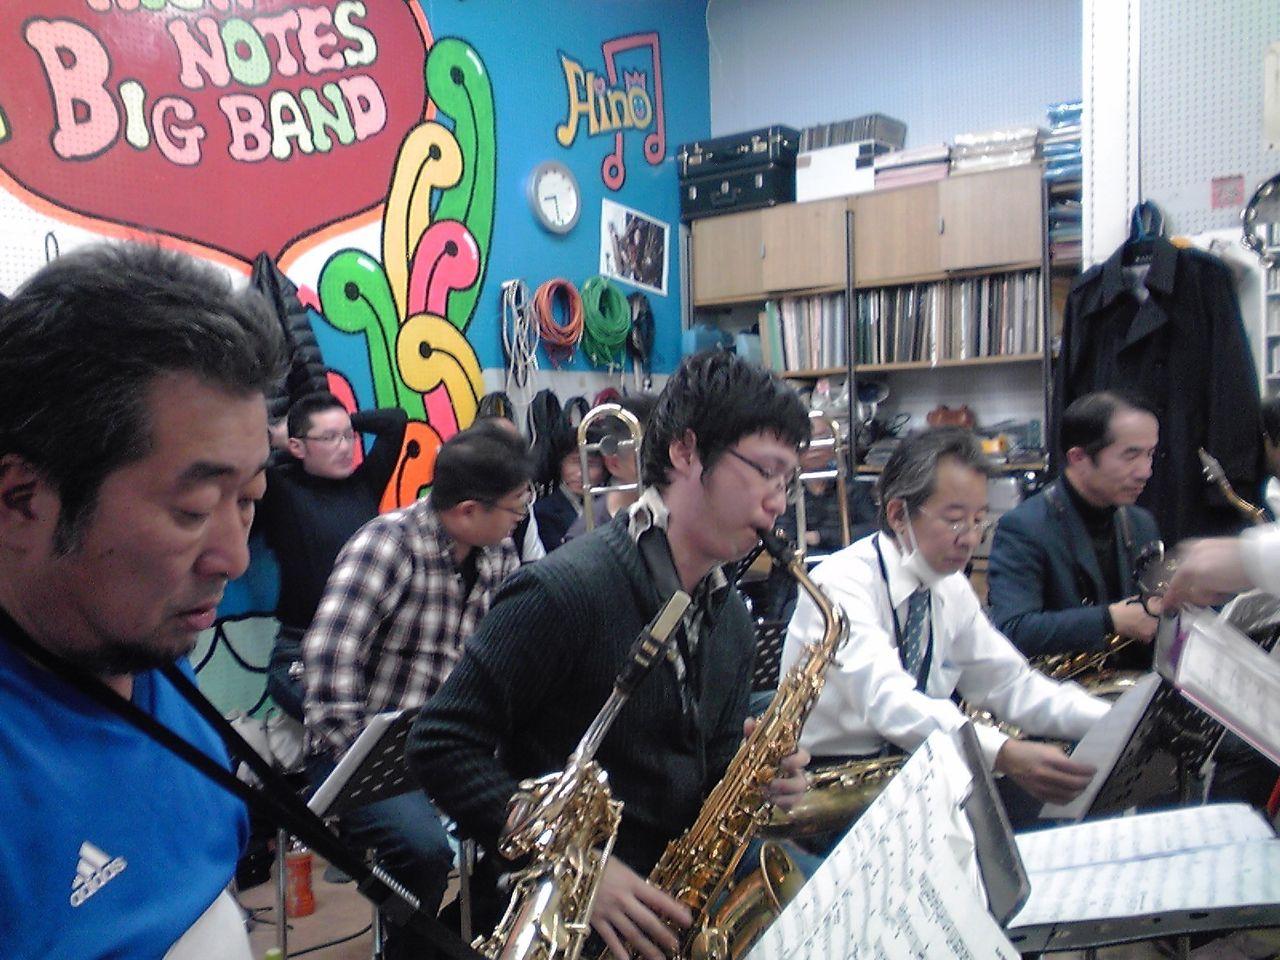 High Notes Big Band結成30周年記念ライブ「赤と黒の融合」